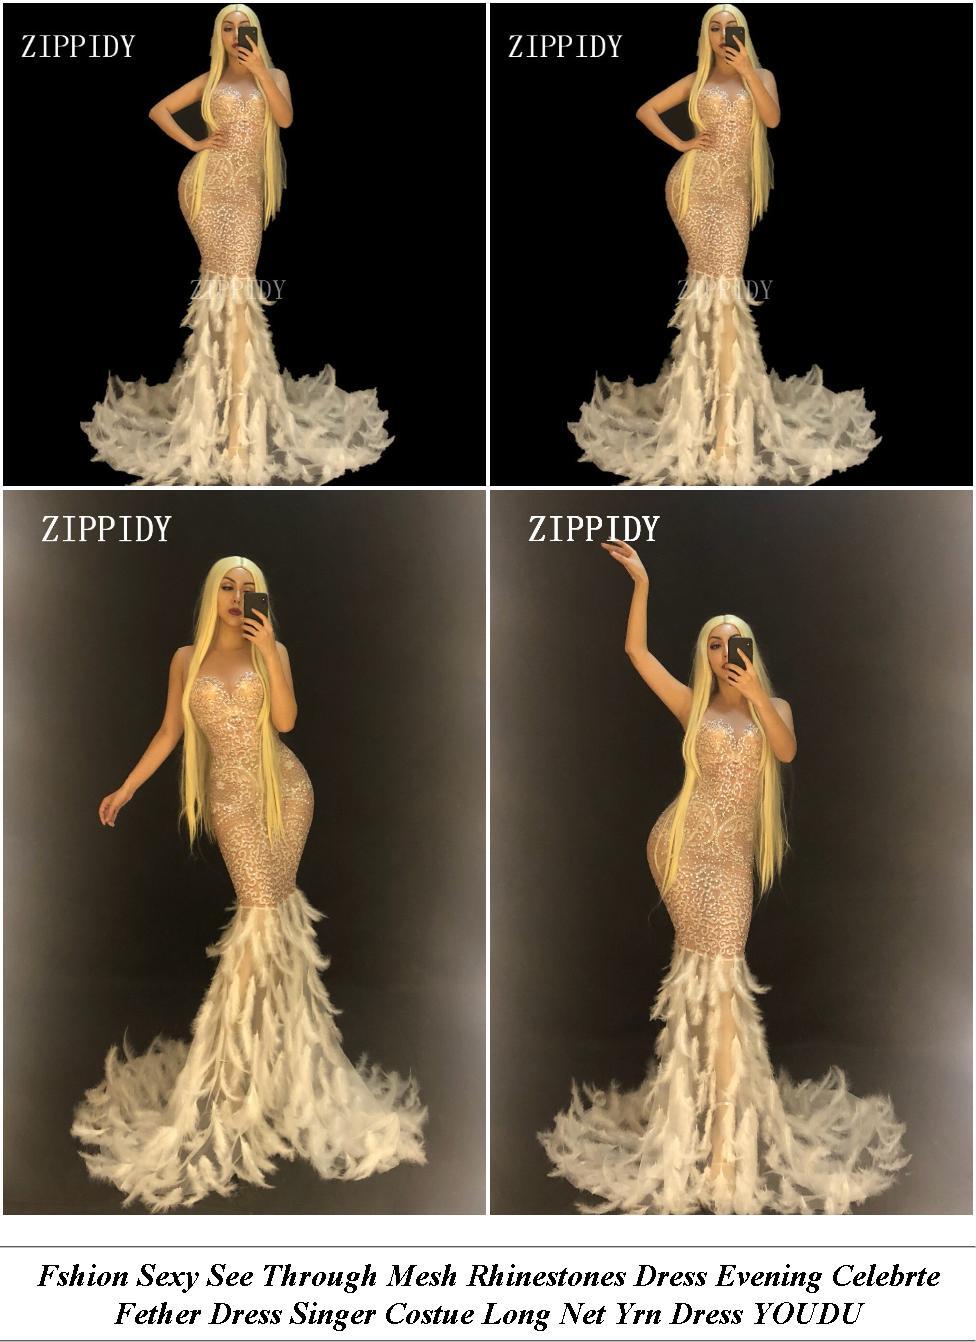 Woman Dress Png Images - Shop Online Usa Sale - Mens Dress Outfit With Lack Shoes